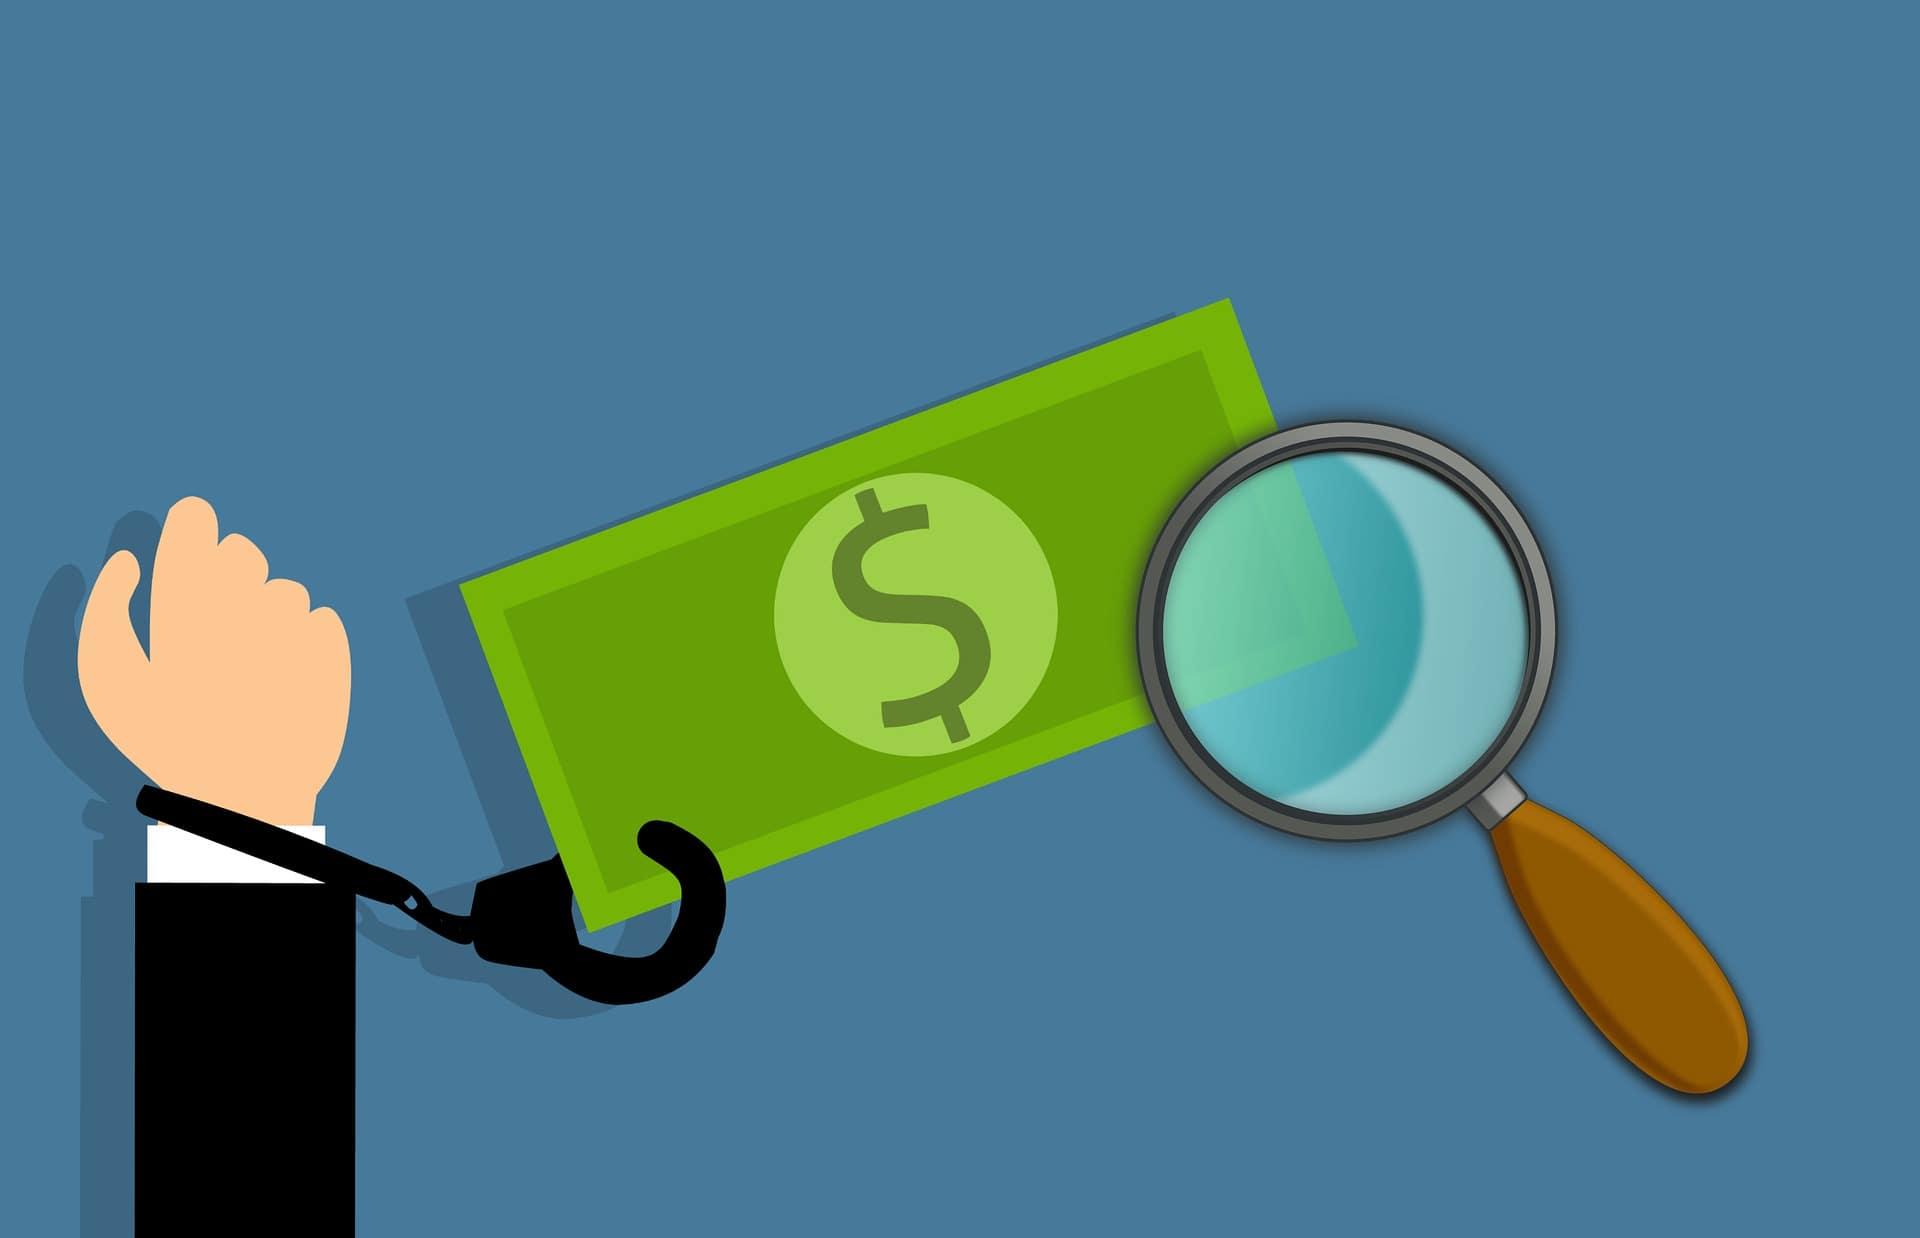 fraud-42270991920-min.jpg